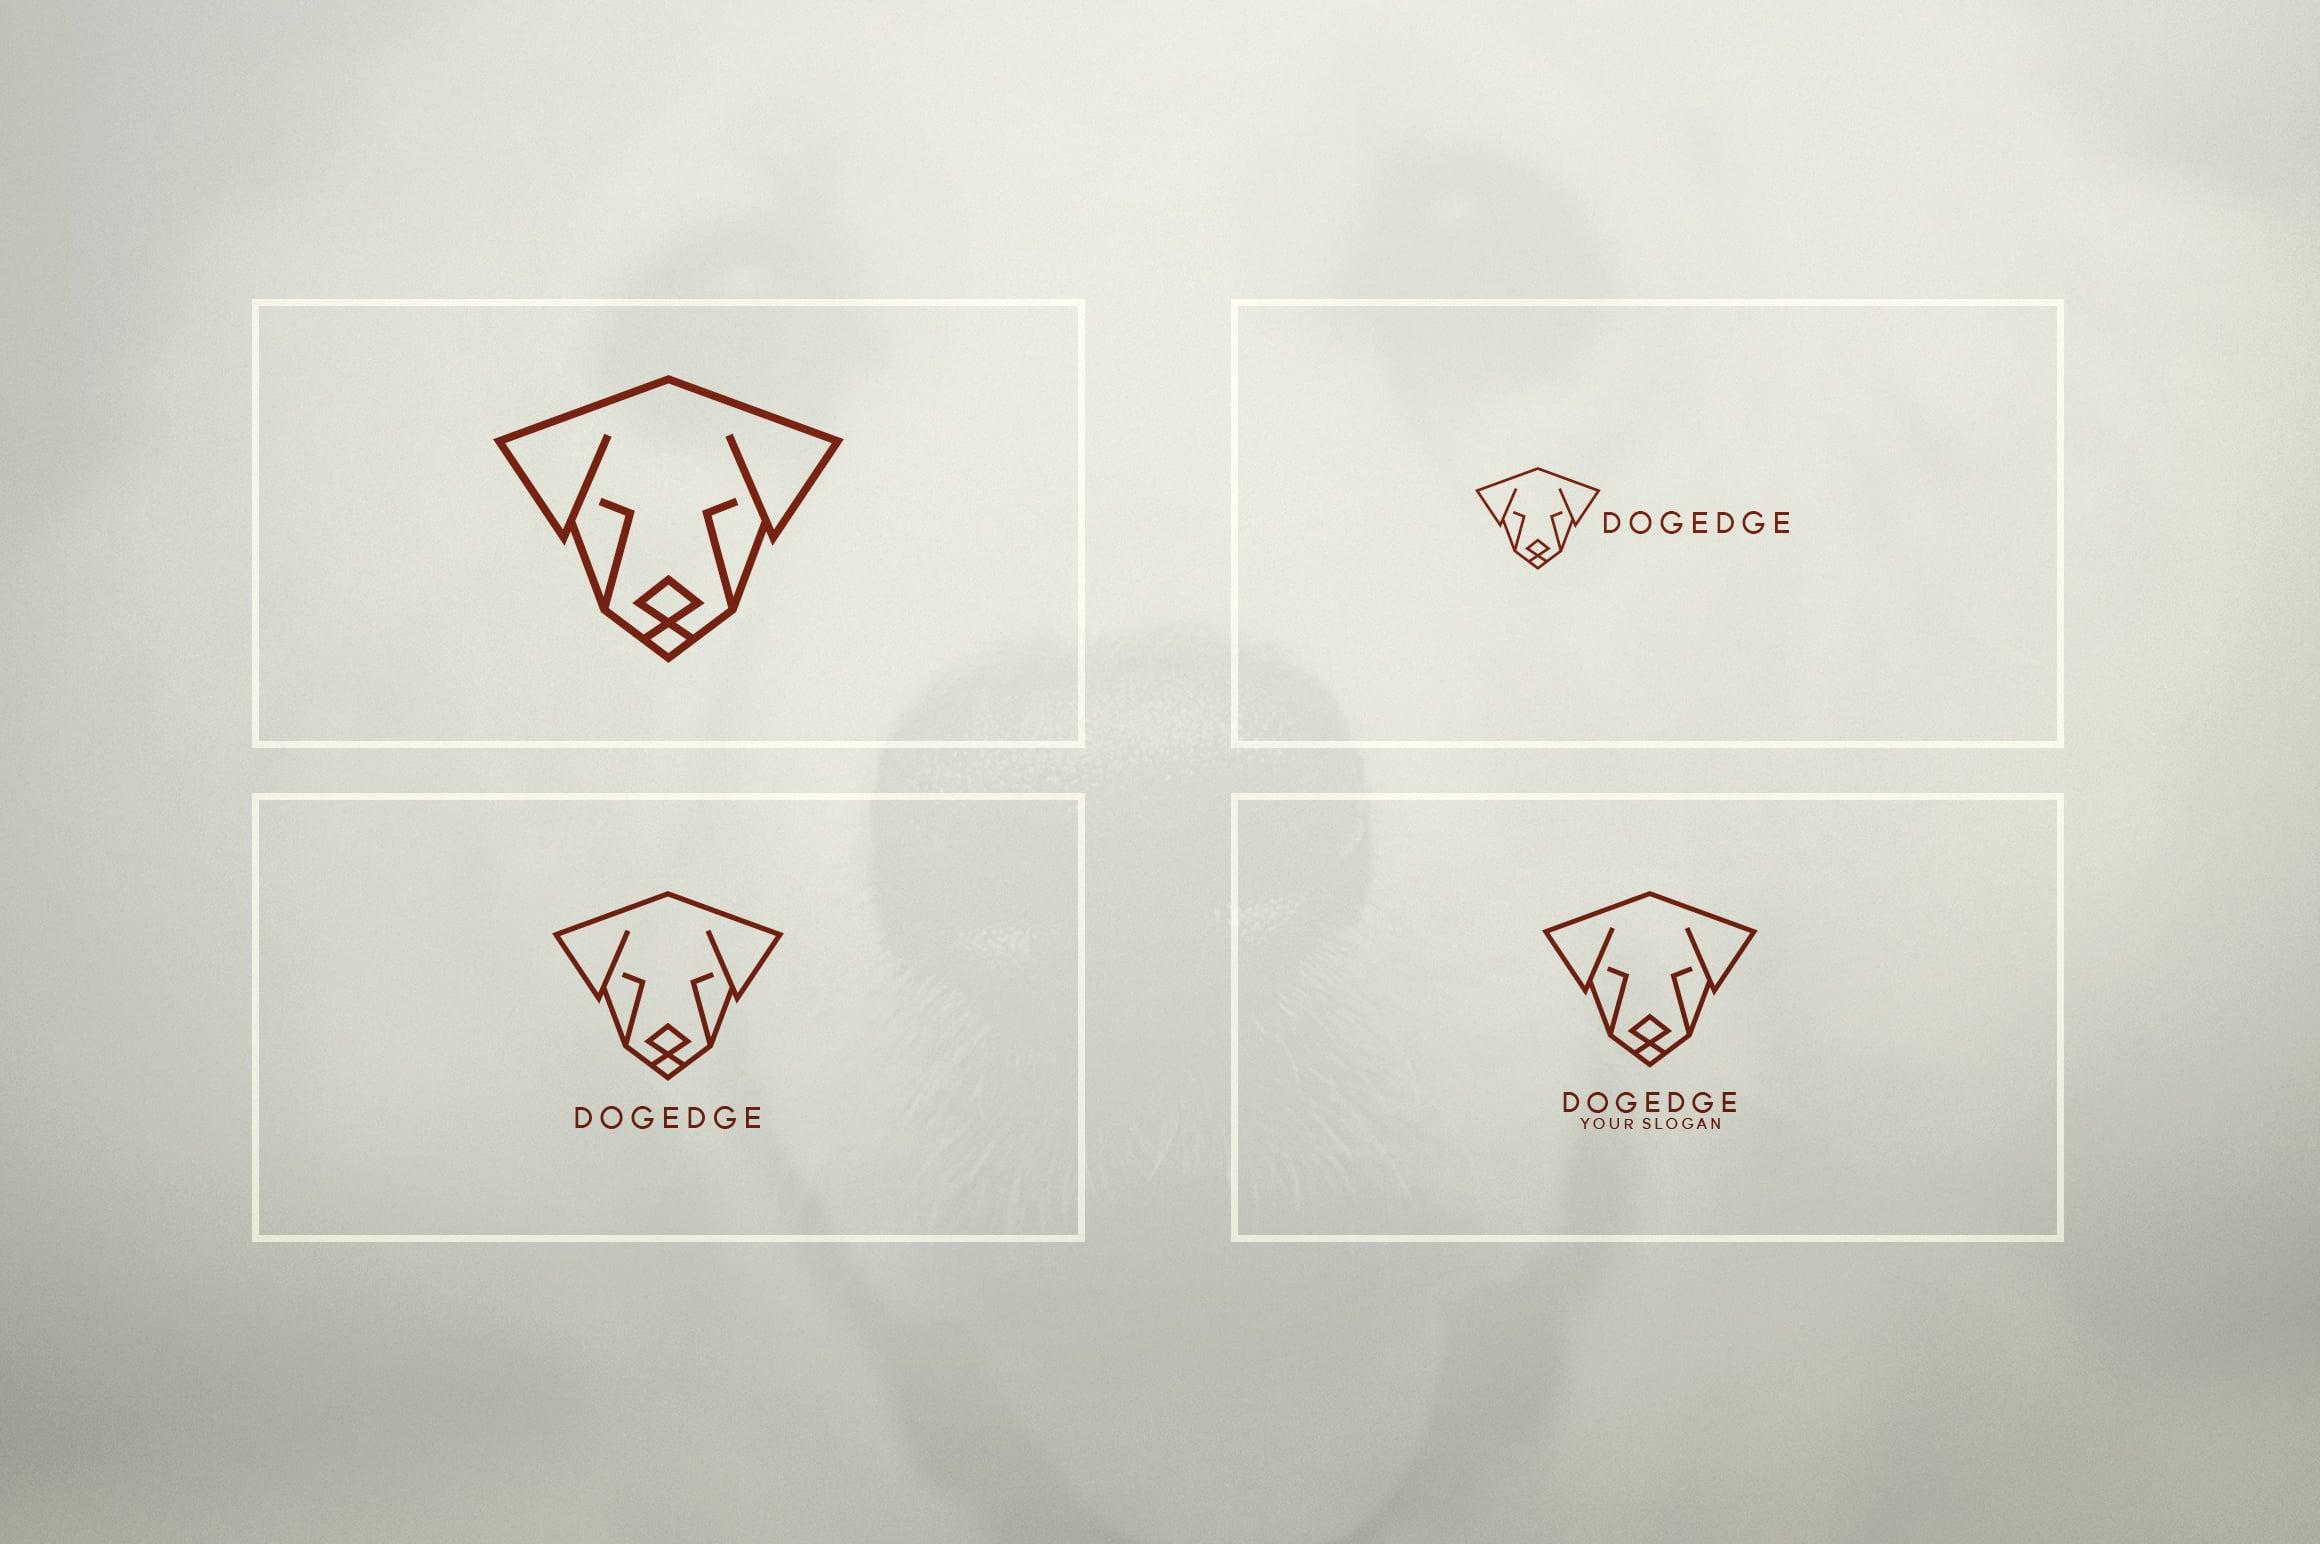 17 Geometric Animal Icons and Logos - 13